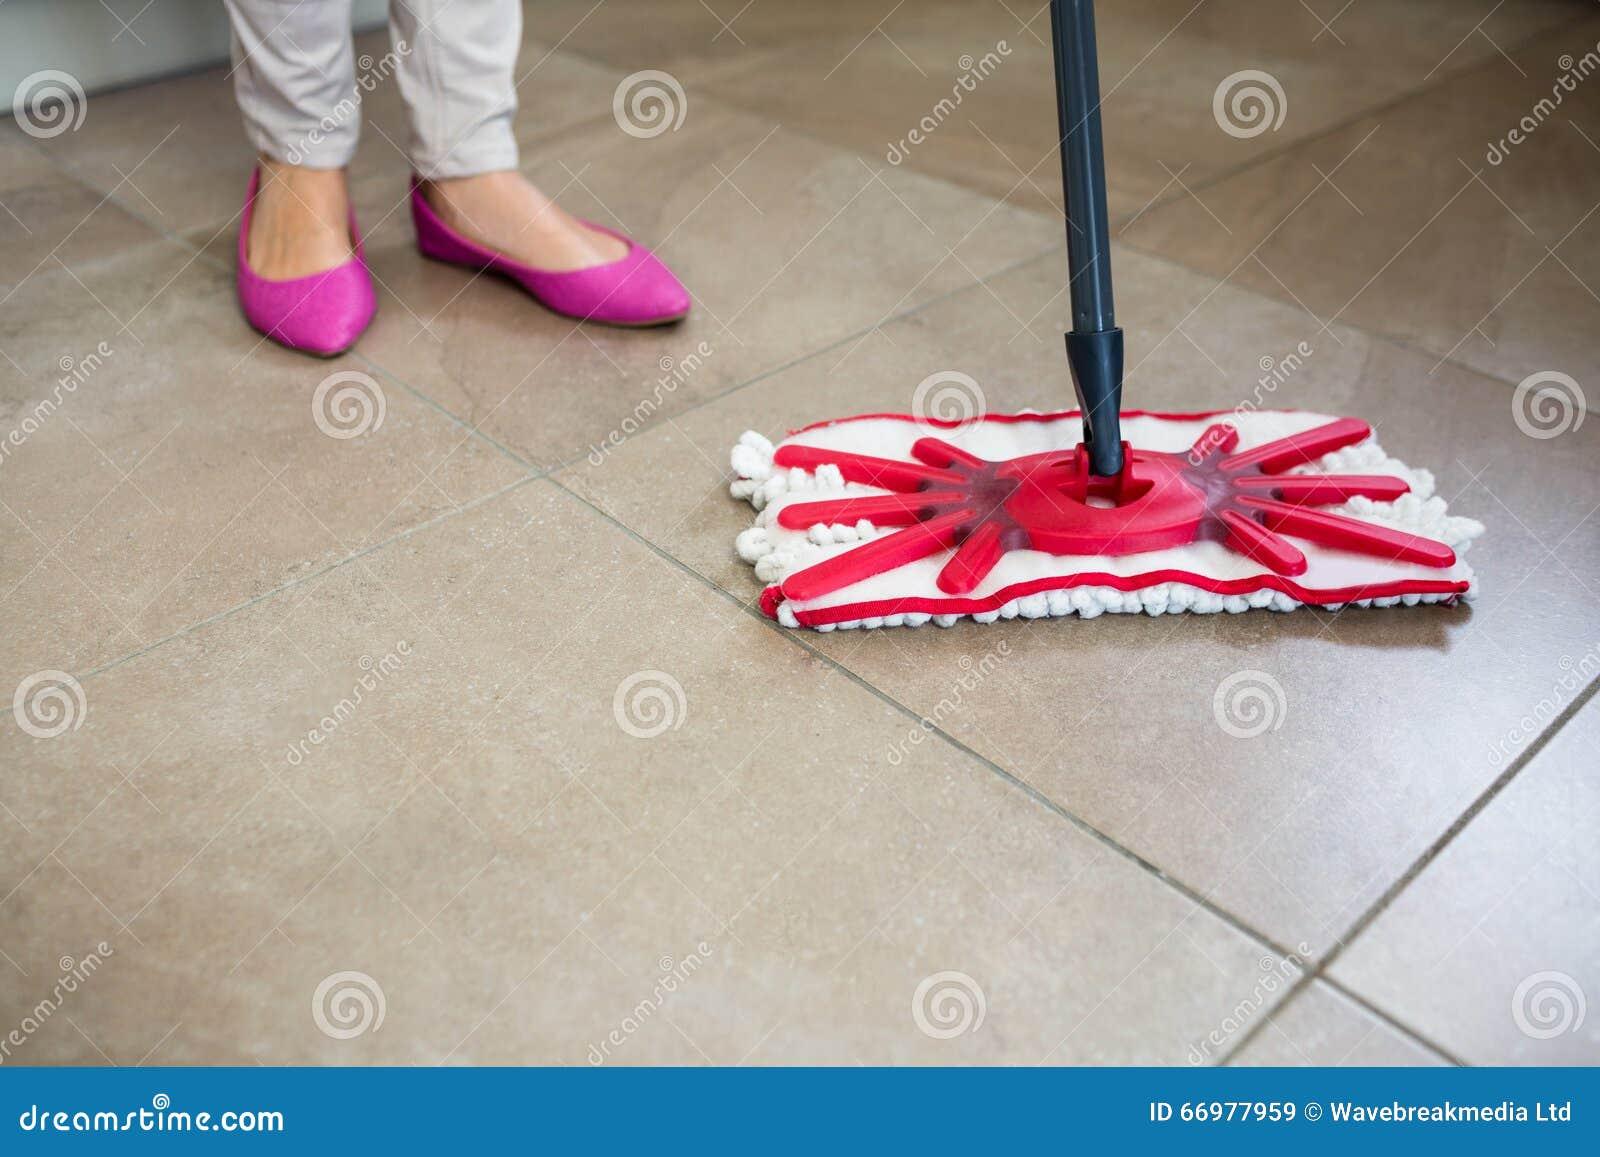 Kitchen Floor Mops Woman Swiping The Kitchen Floor Stock Photo Image 66977959